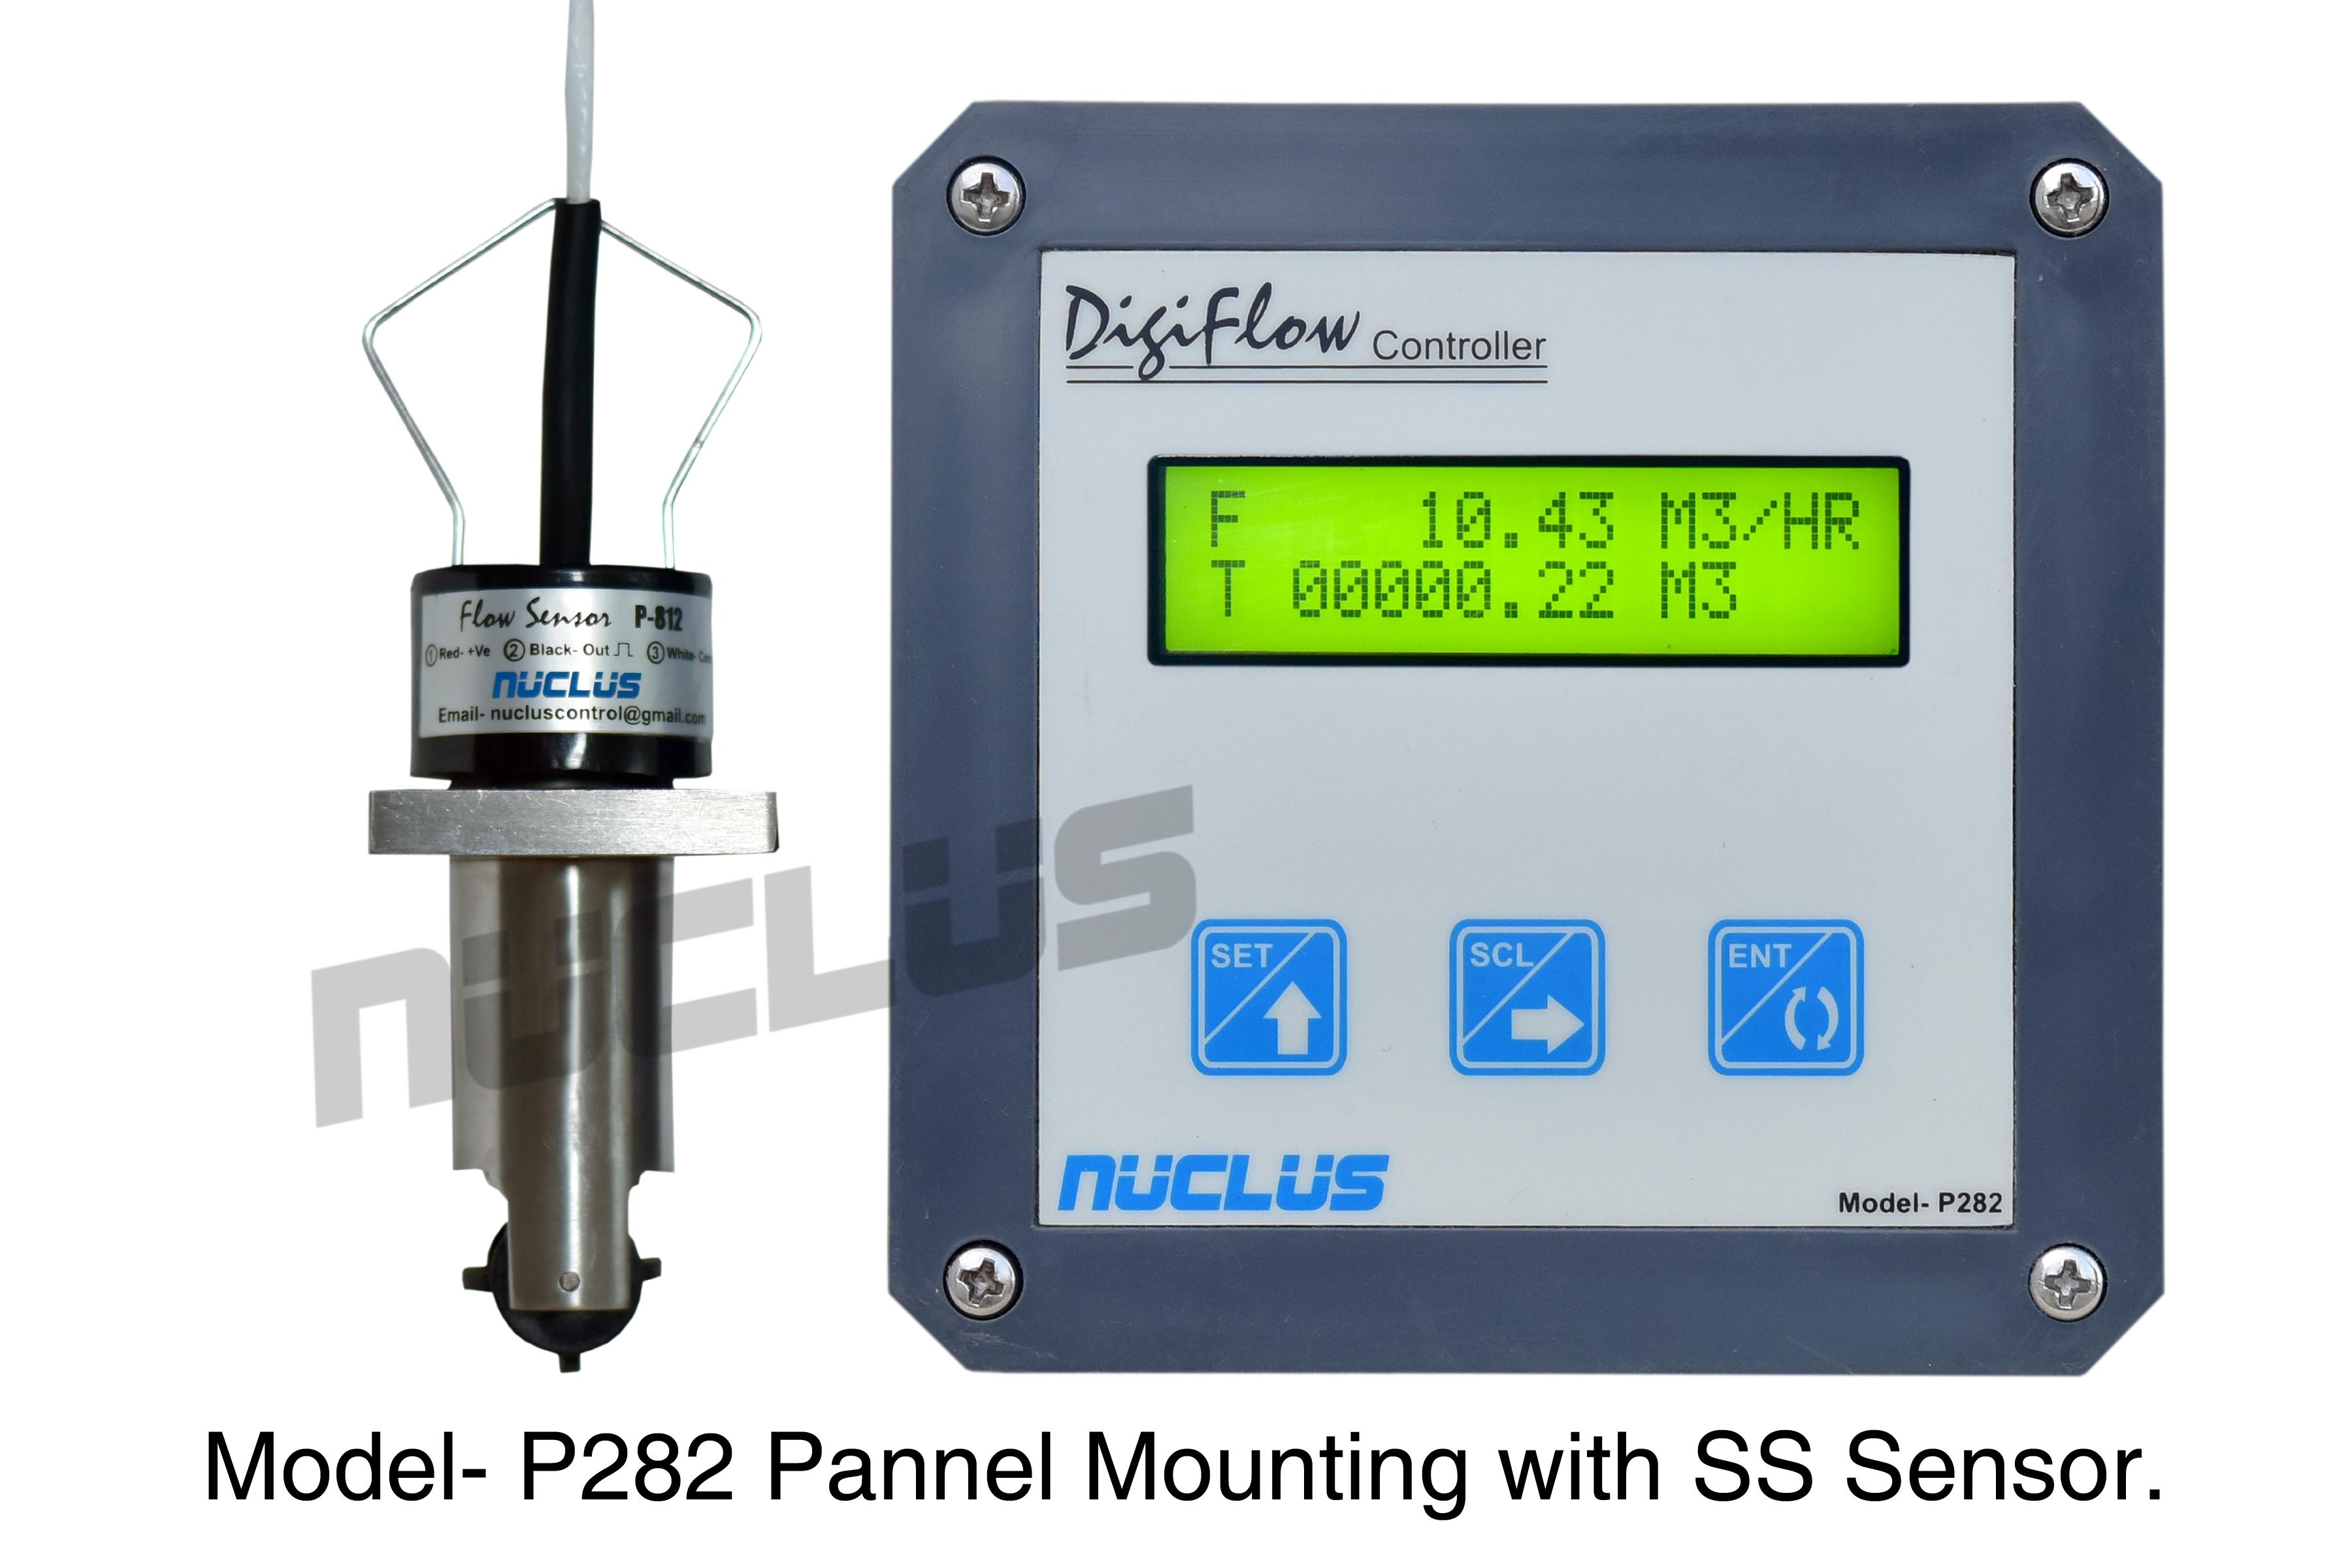 Digital Flow Controller Panel Mounting